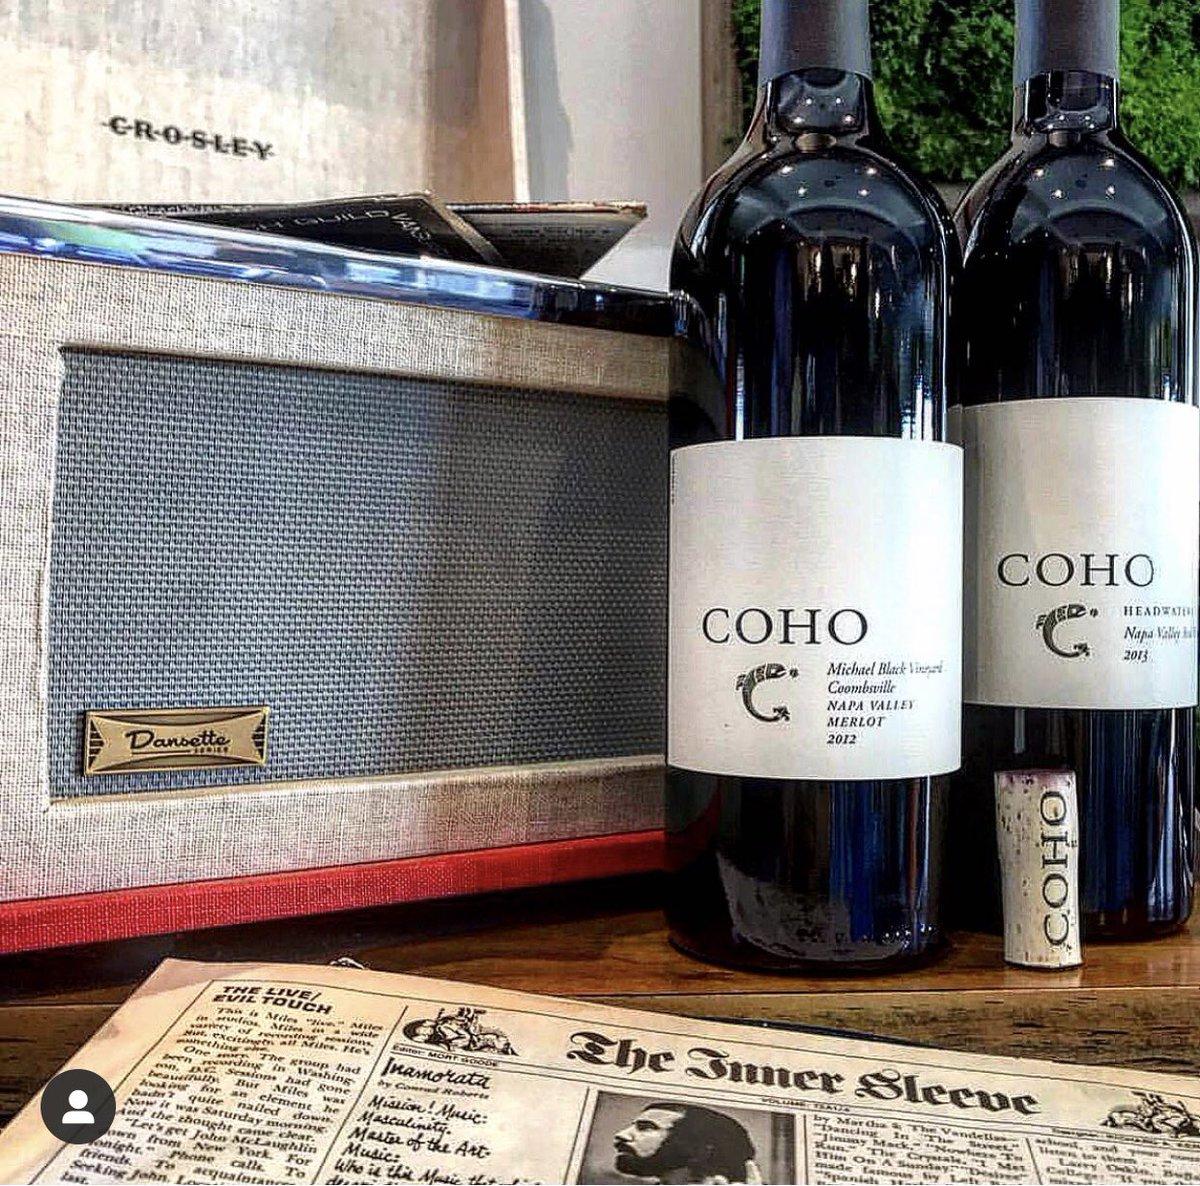 When music collides with wine it's pure happiness. #MusicMonday #MondayMotivaton #MondayVibes #music #wine #winelover @CrosleyRadio #crosley #crosleyradio